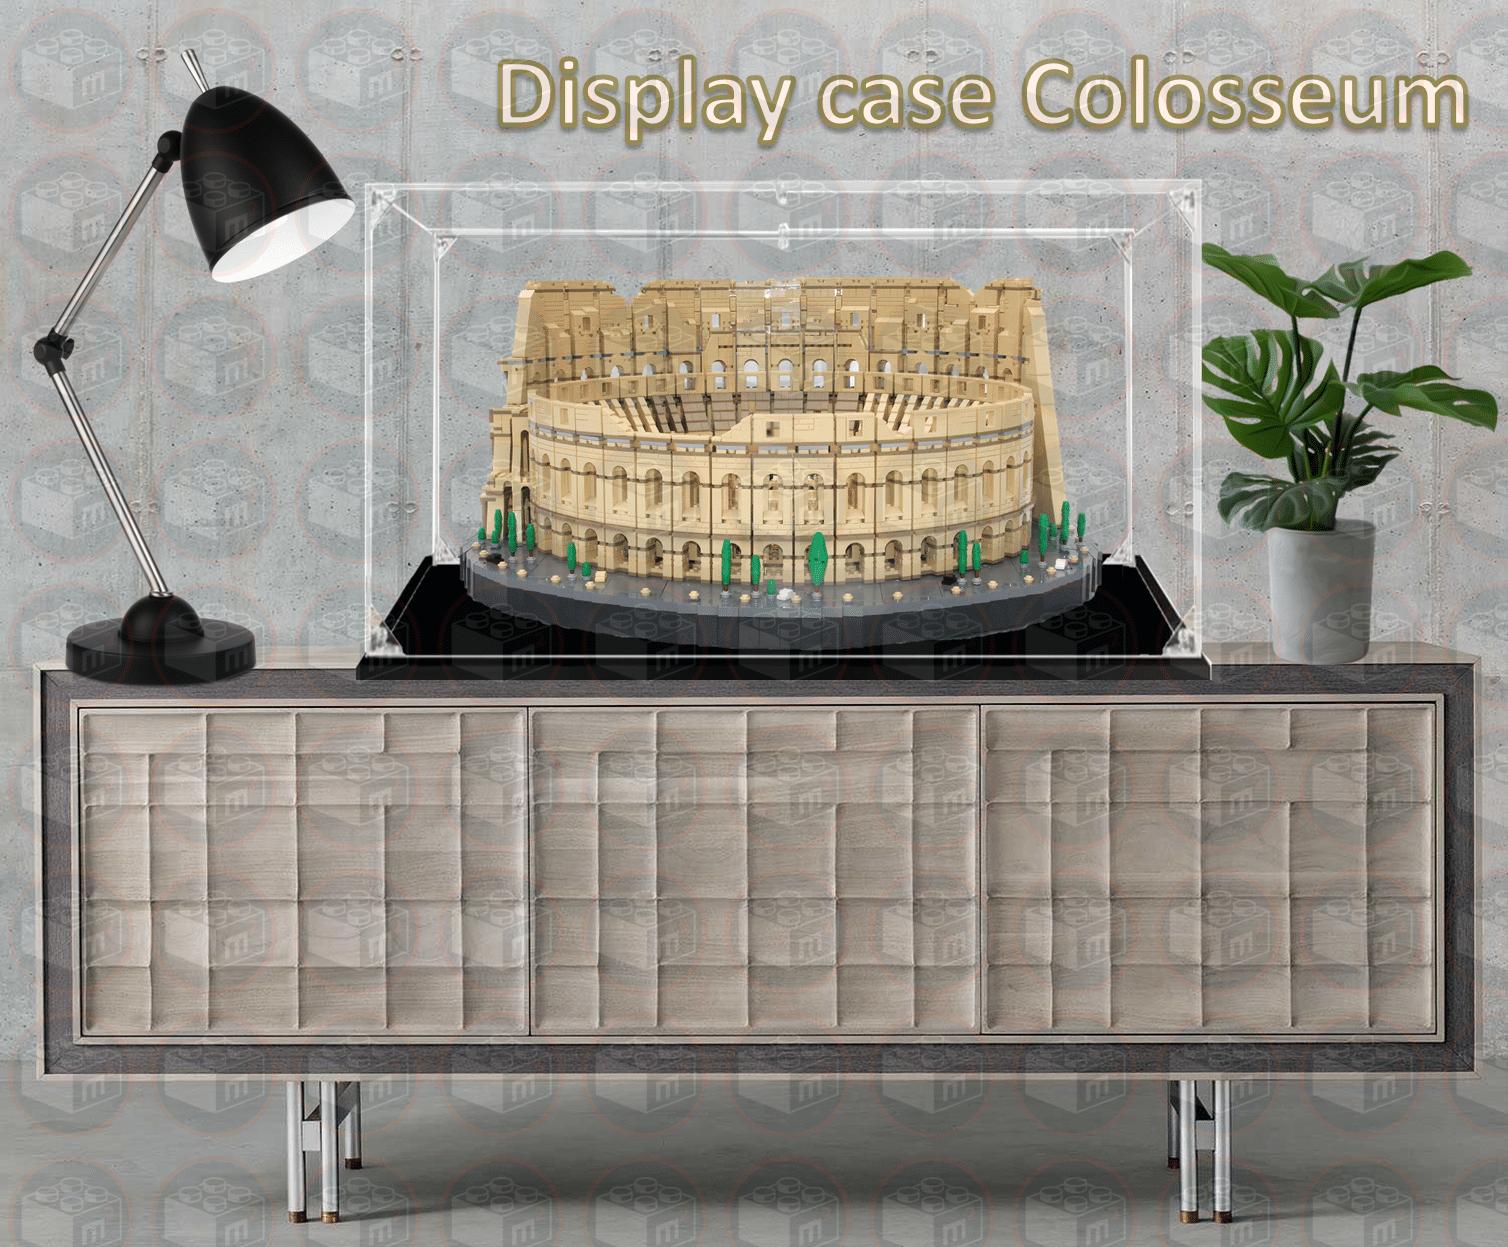 display case lego colosseum